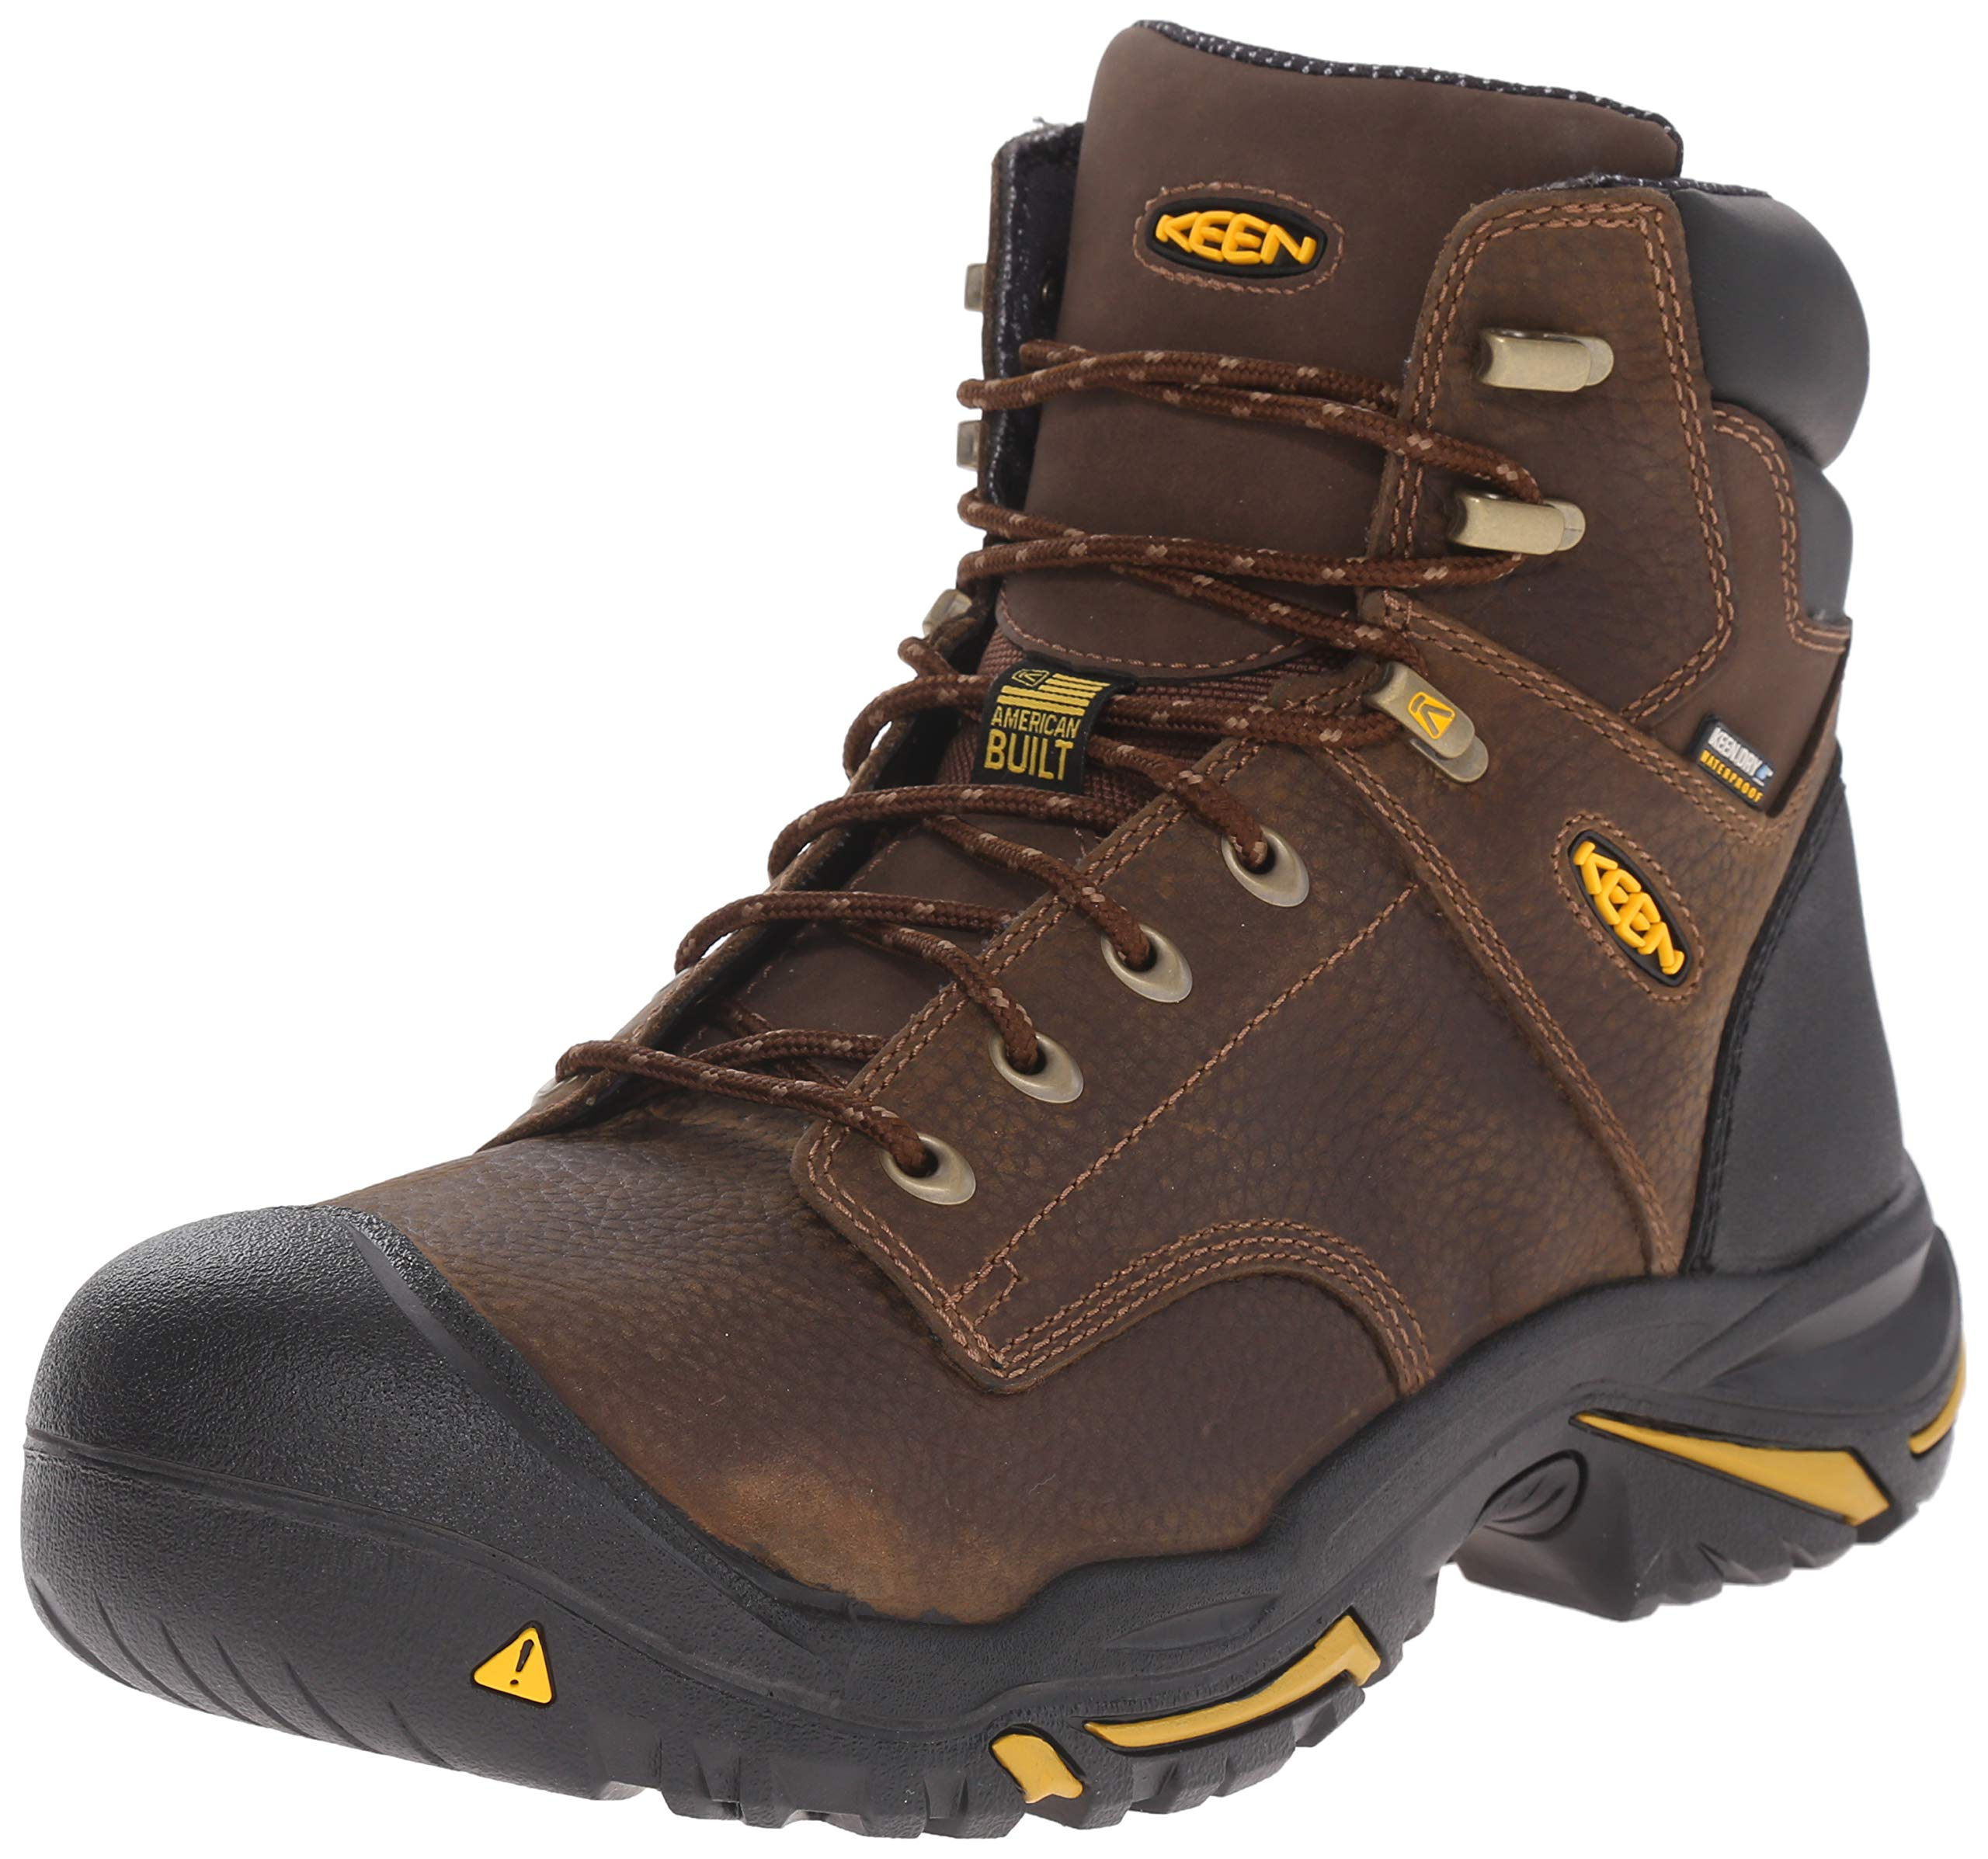 "KEEN Utility - Men's Mt Vernon 6"" (Soft Toe) Work Boots"